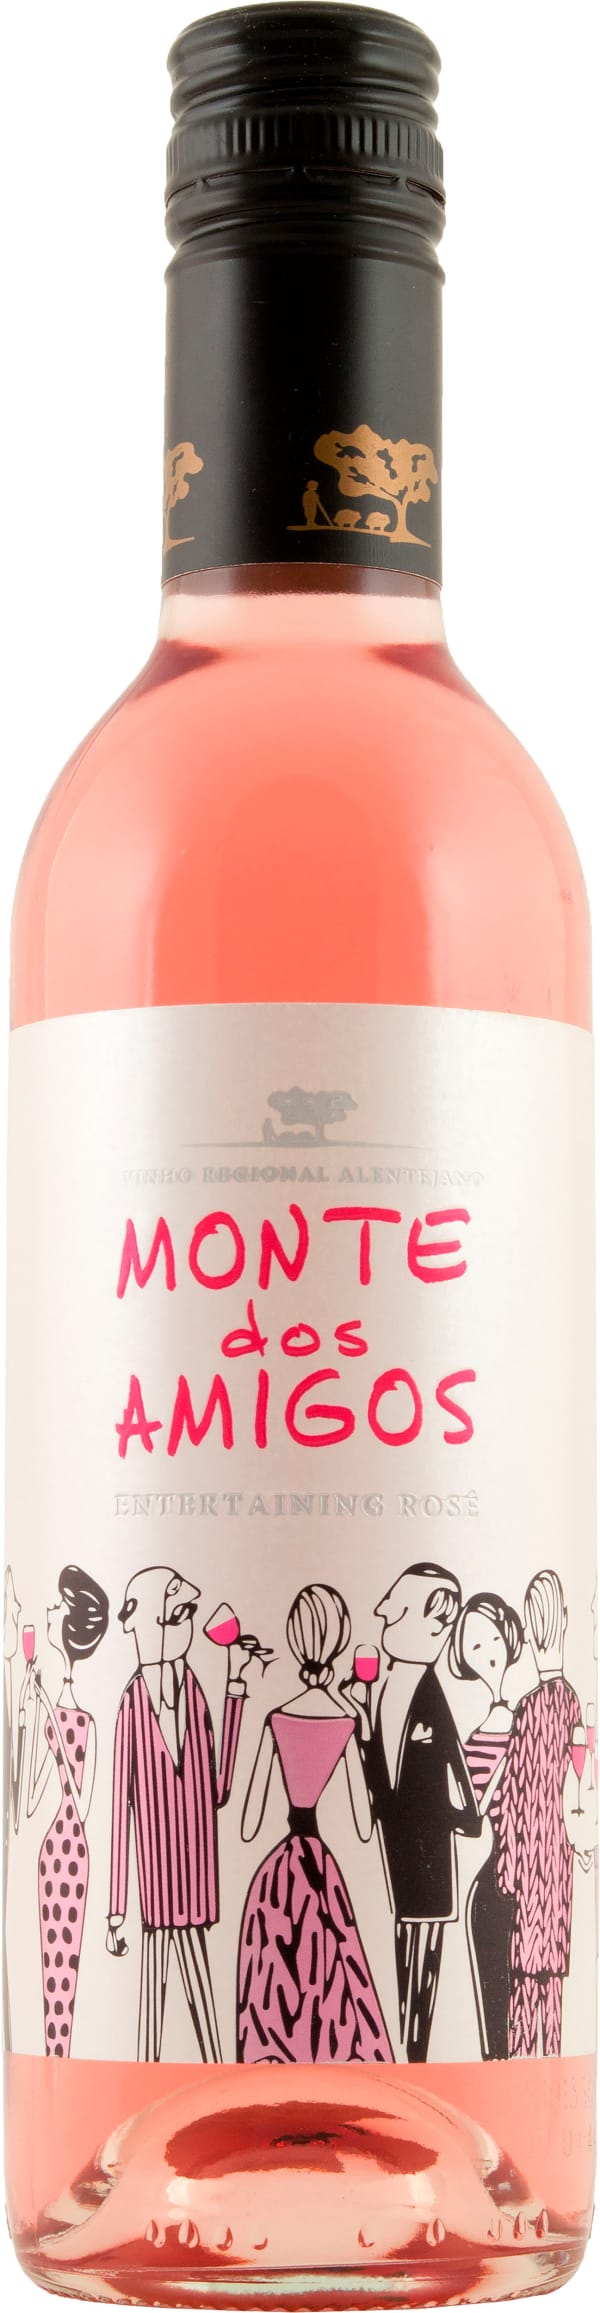 Monte dos Amigos Rosé 2018